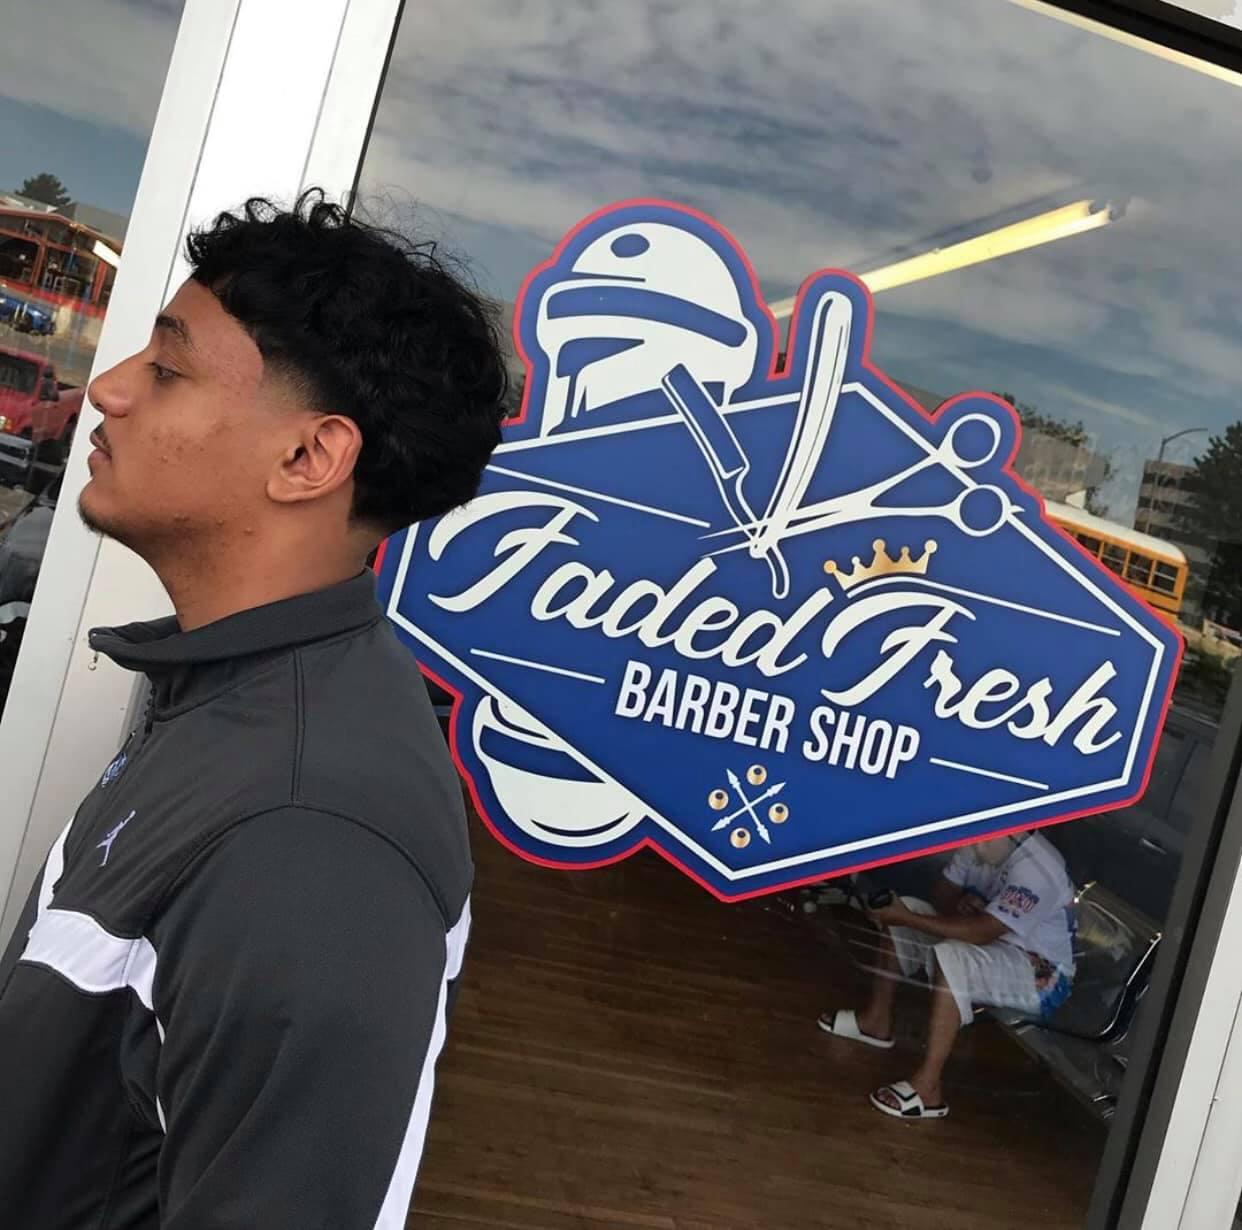 Faded Fresh Barbershop